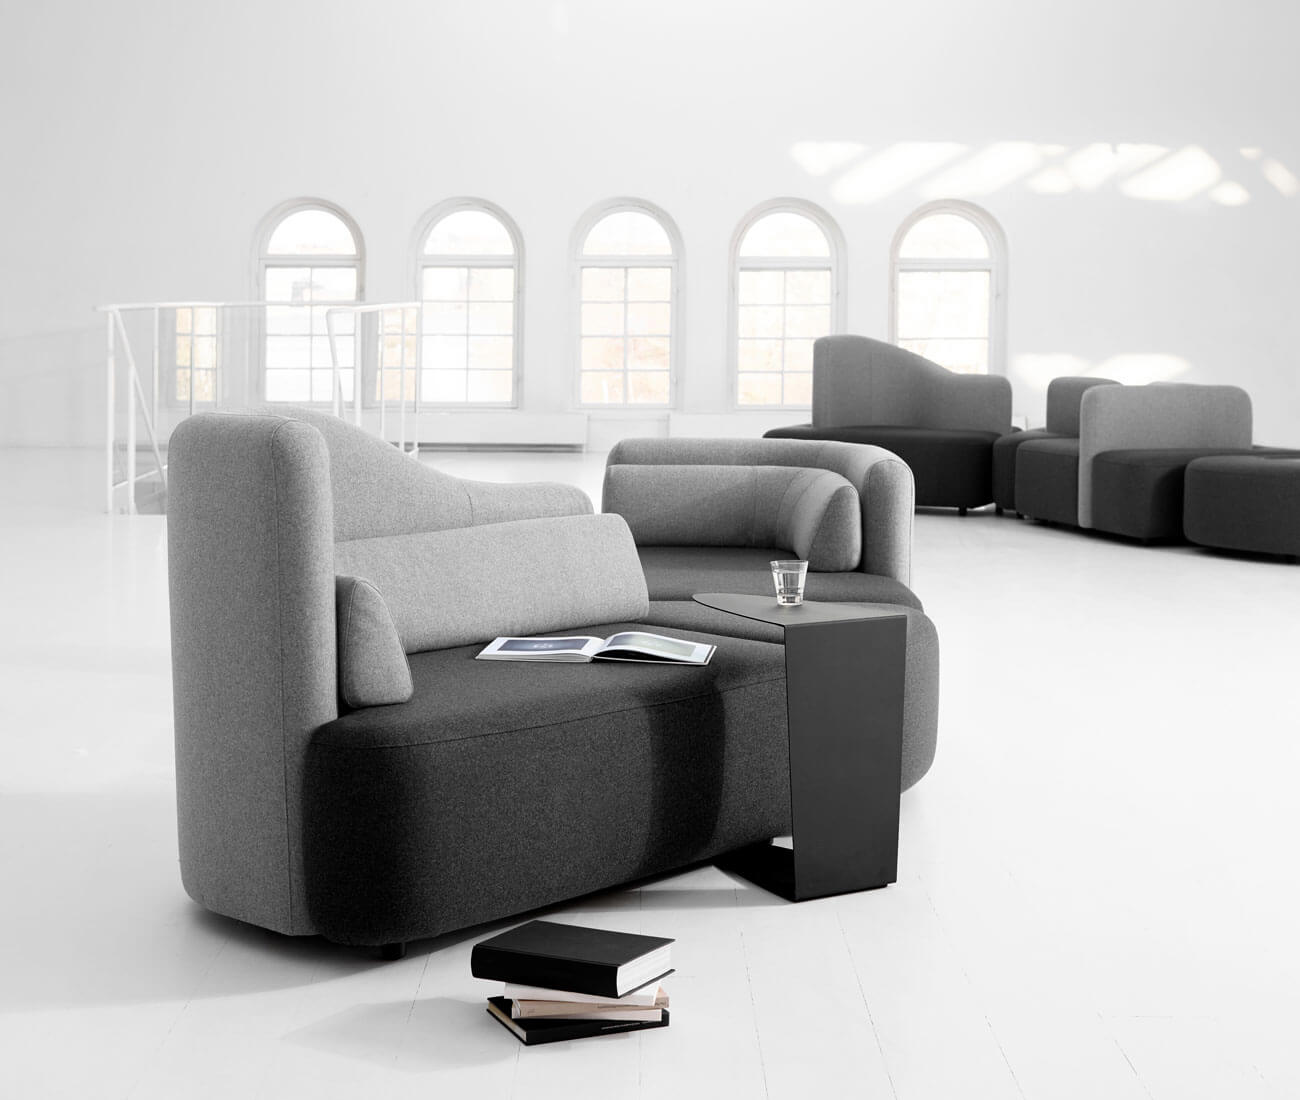 Fabric modular sofas